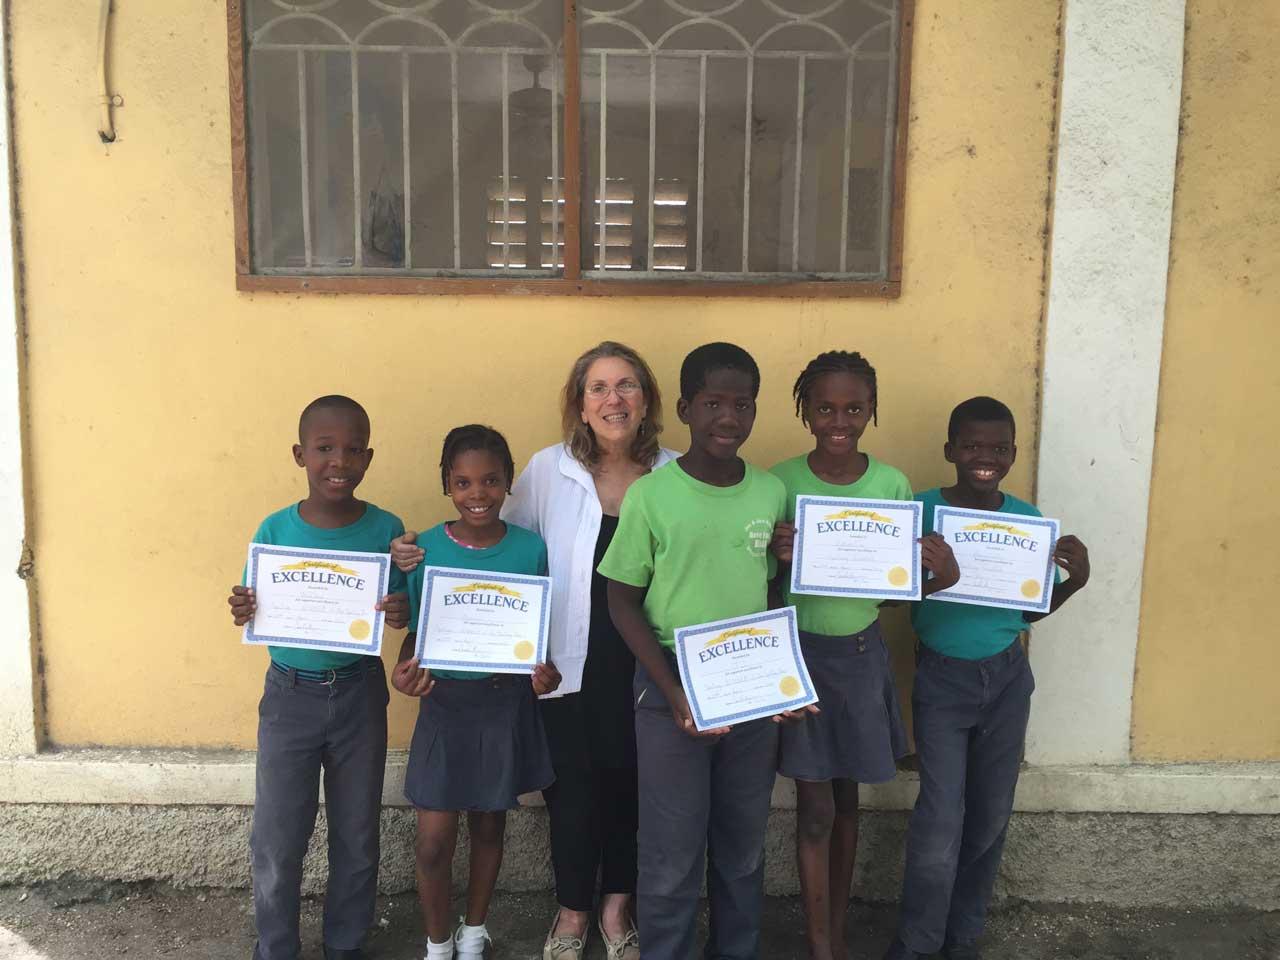 Have Faith Haiti Spelling Bee April 2016 -2